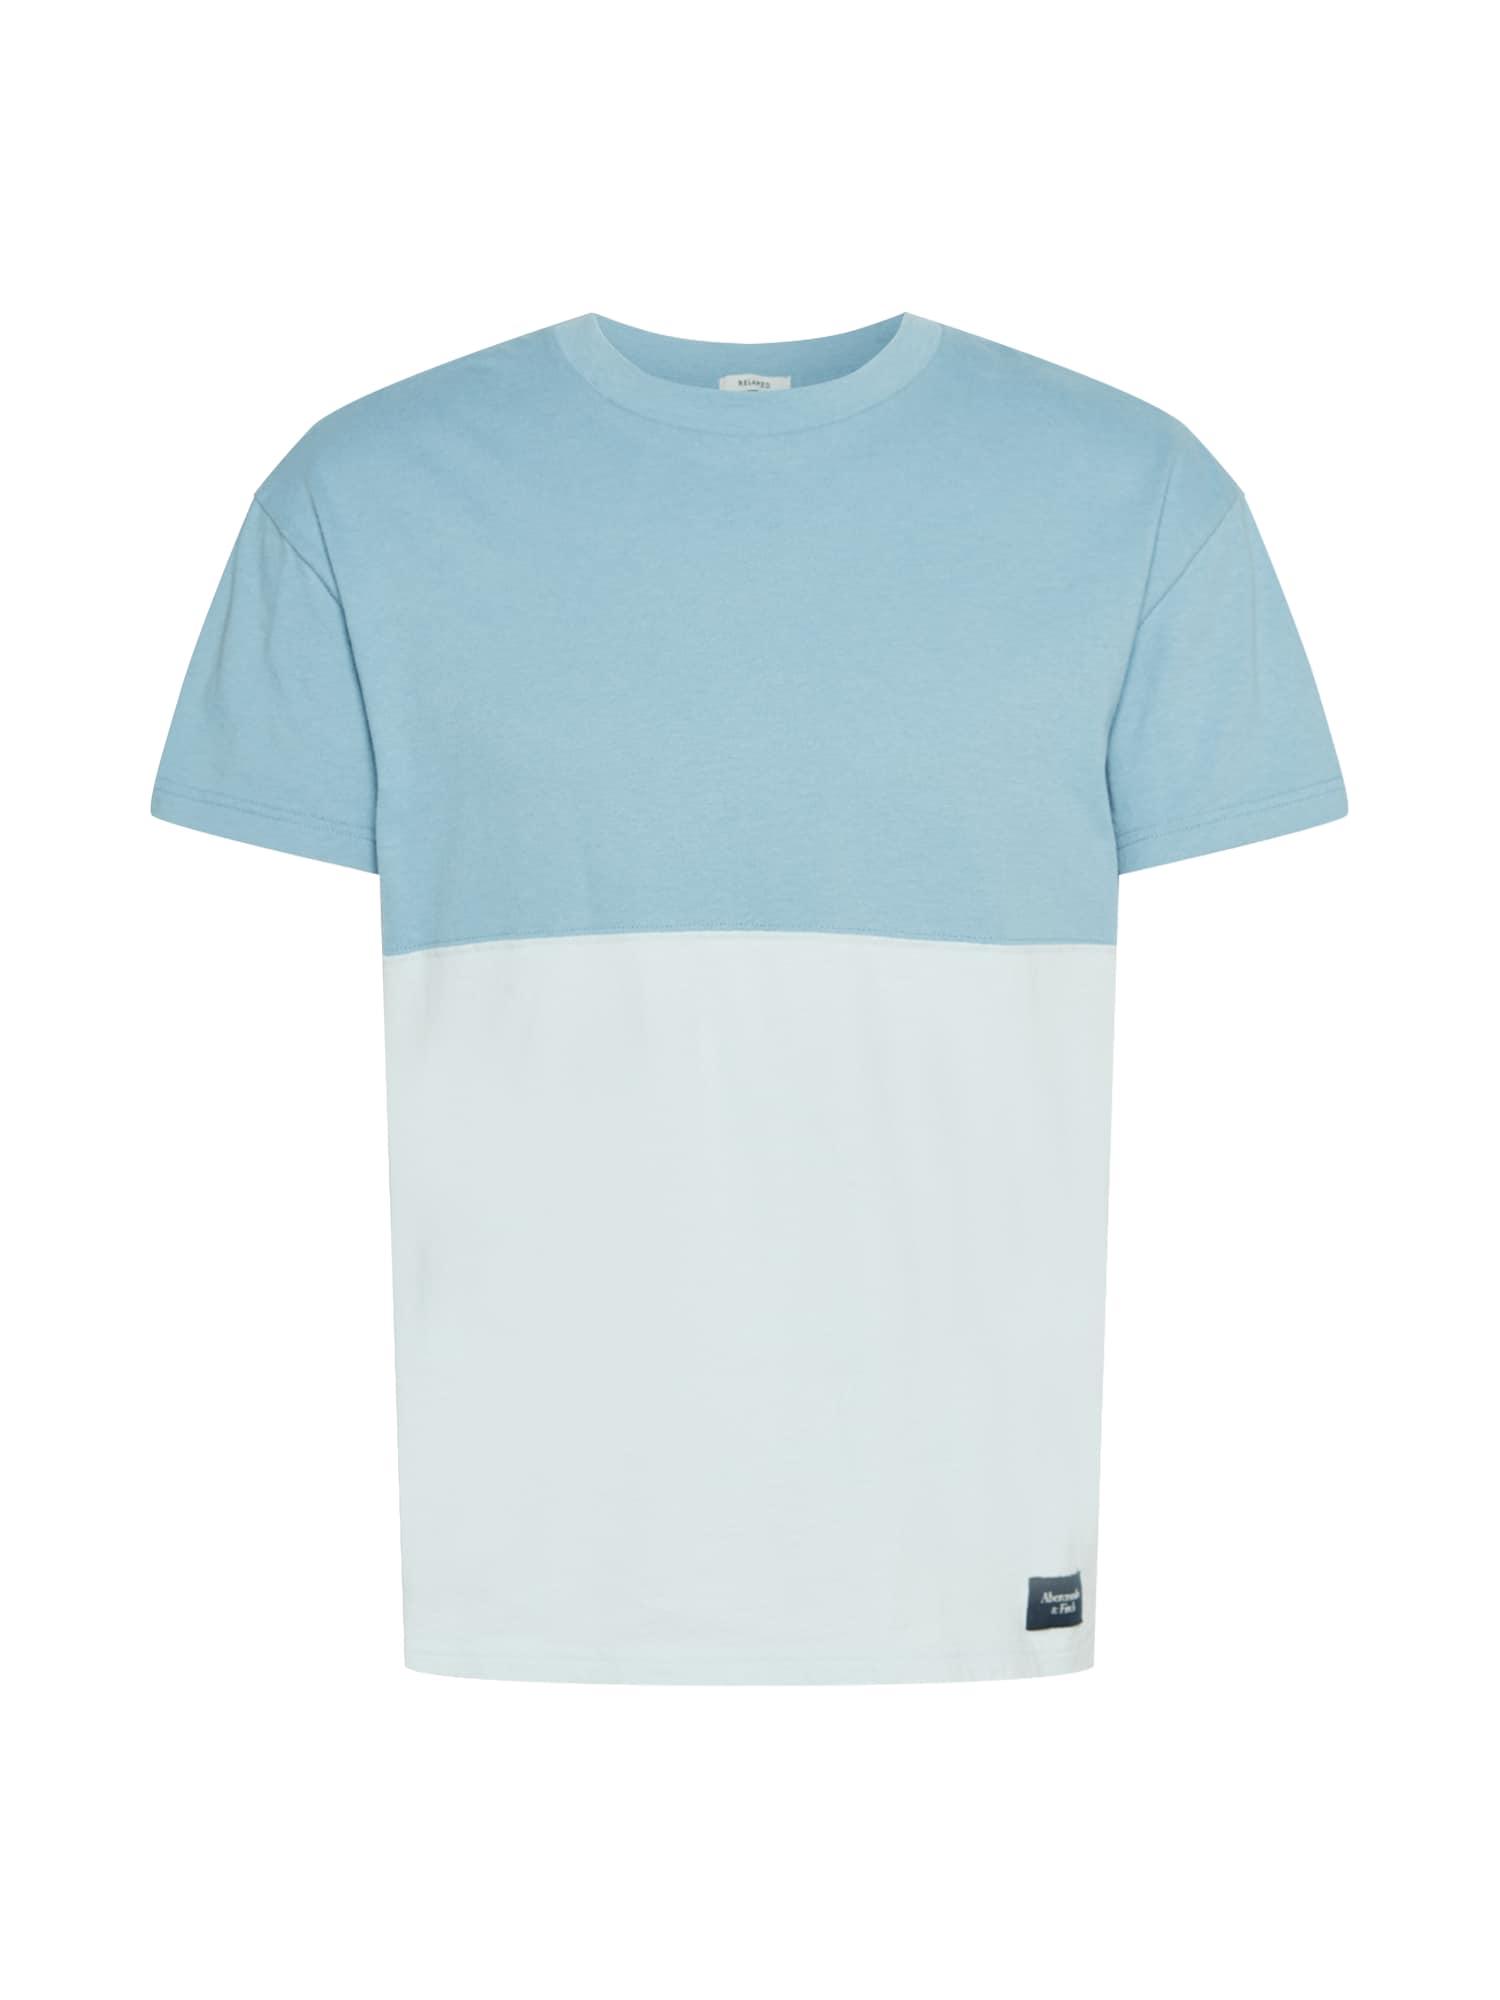 Abercrombie & Fitch Marškinėliai šviesiai mėlyna / opalo